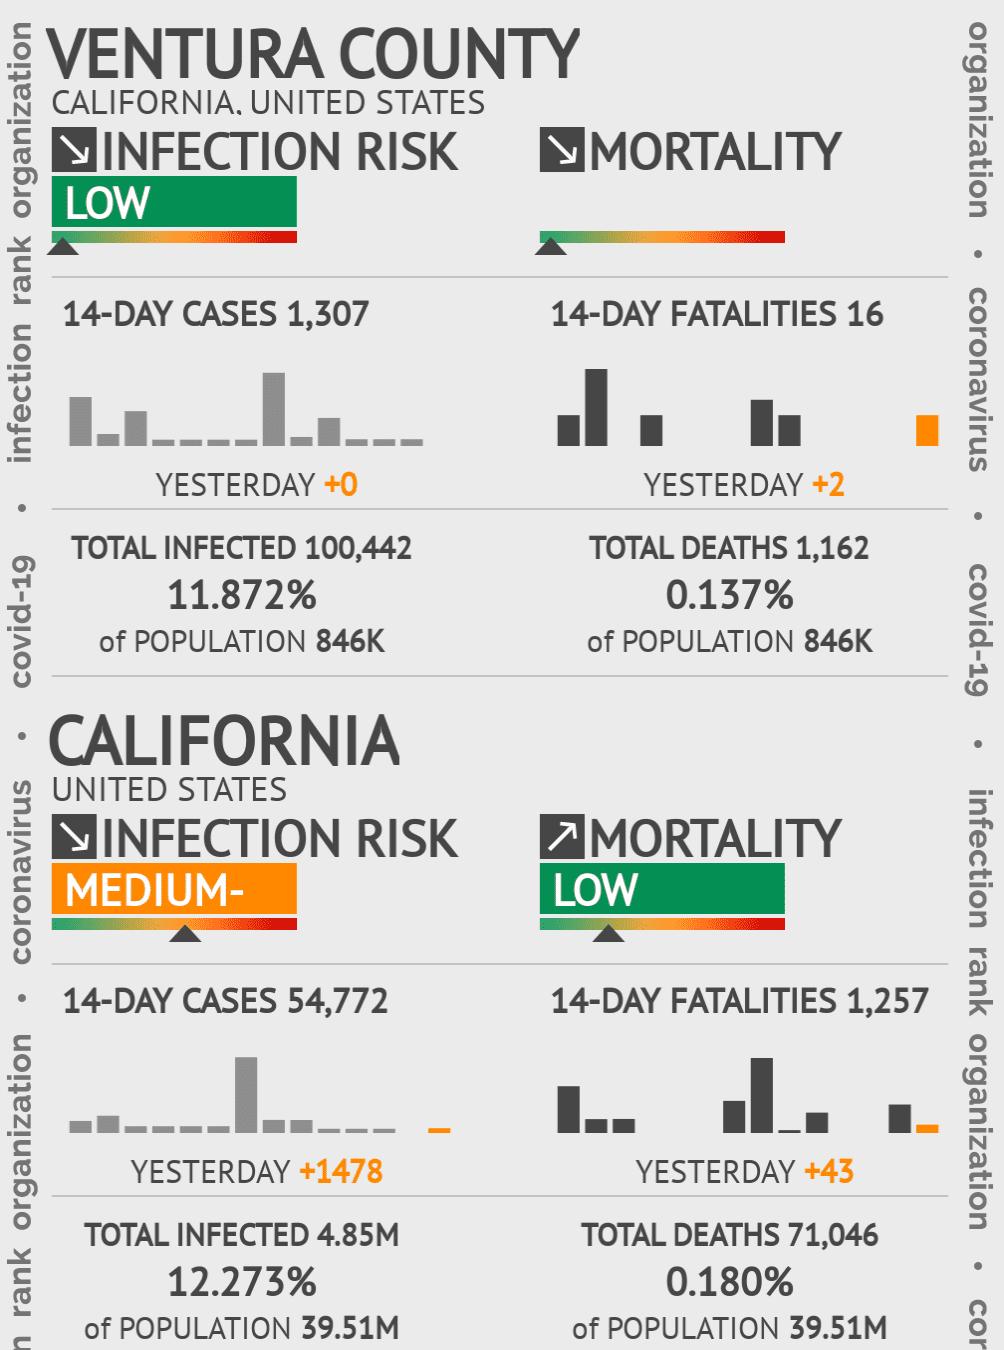 Ventura County Coronavirus Covid-19 Risk of Infection on October 19, 2020